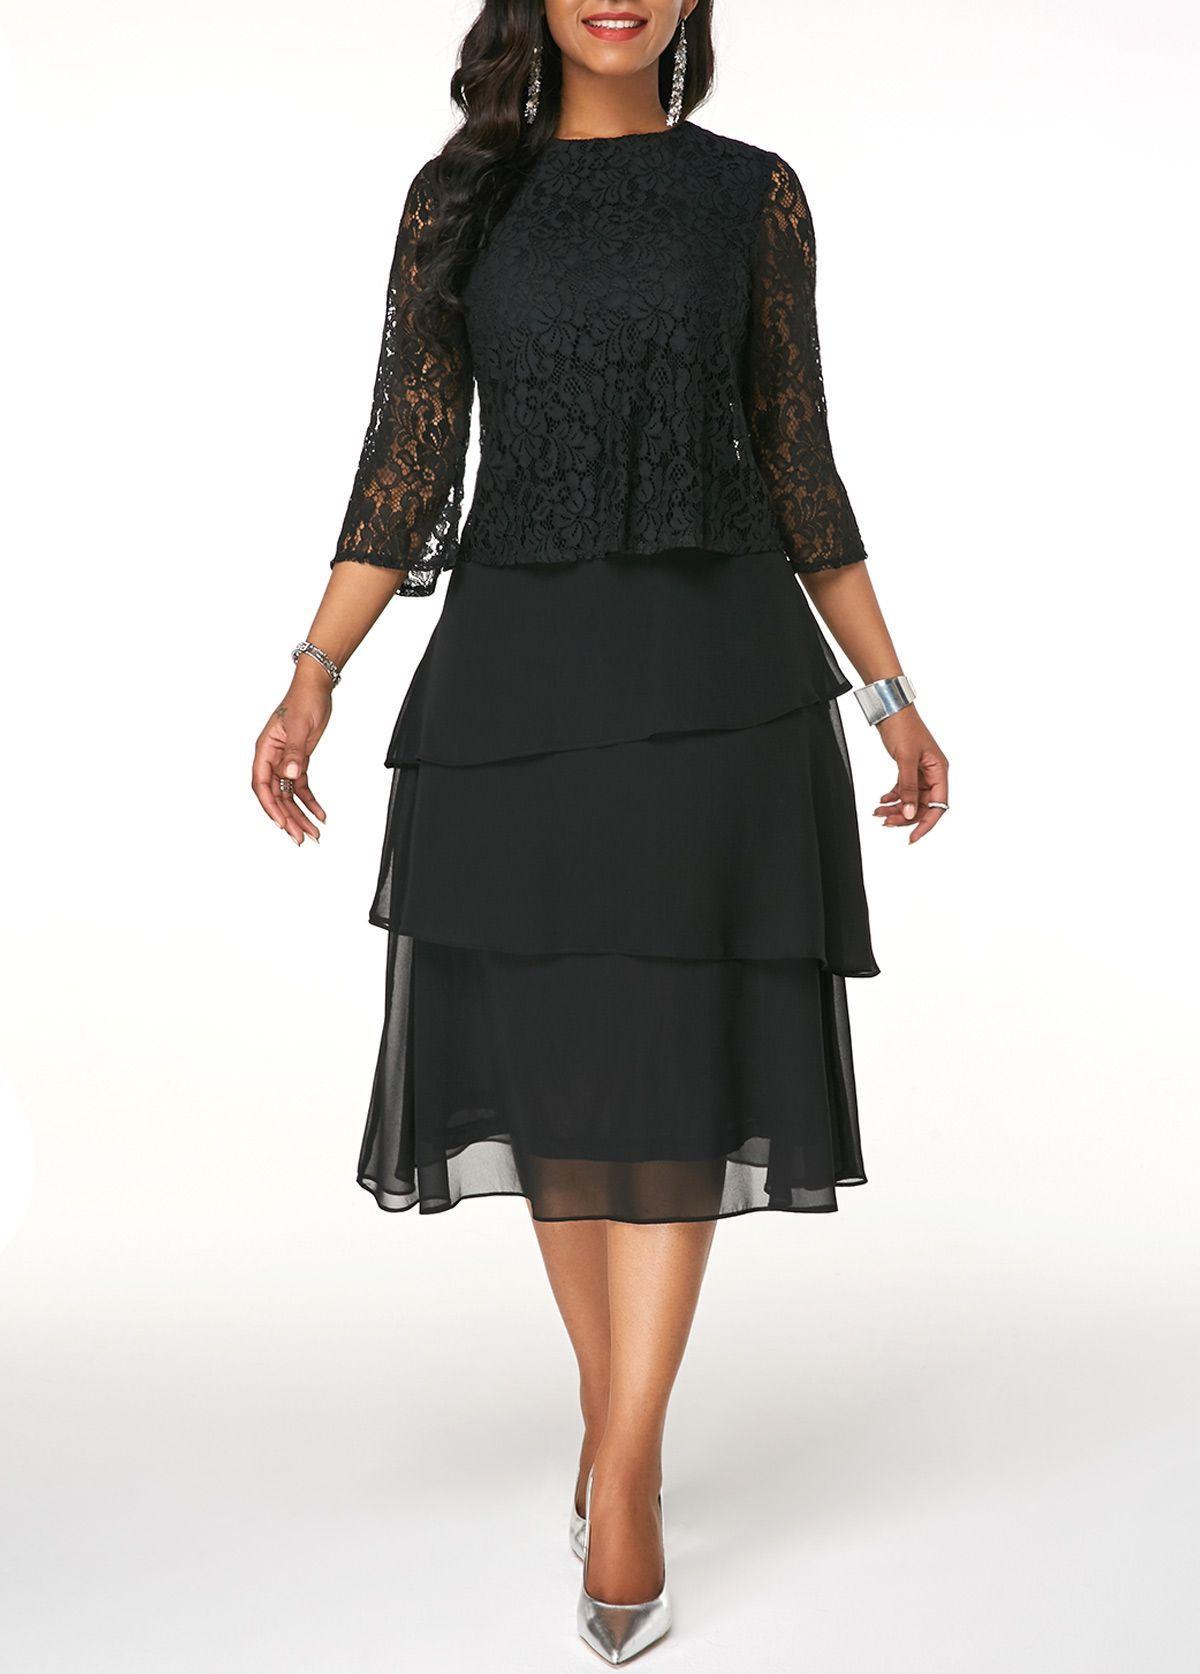 Three Quarter Sleeve Black Layered Chiffon Dress Rotita Com Usd 33 63 Chiffondress Layered Chiffon Dress Half Sleeve Dresses Chiffon Dress [ 1674 x 1200 Pixel ]